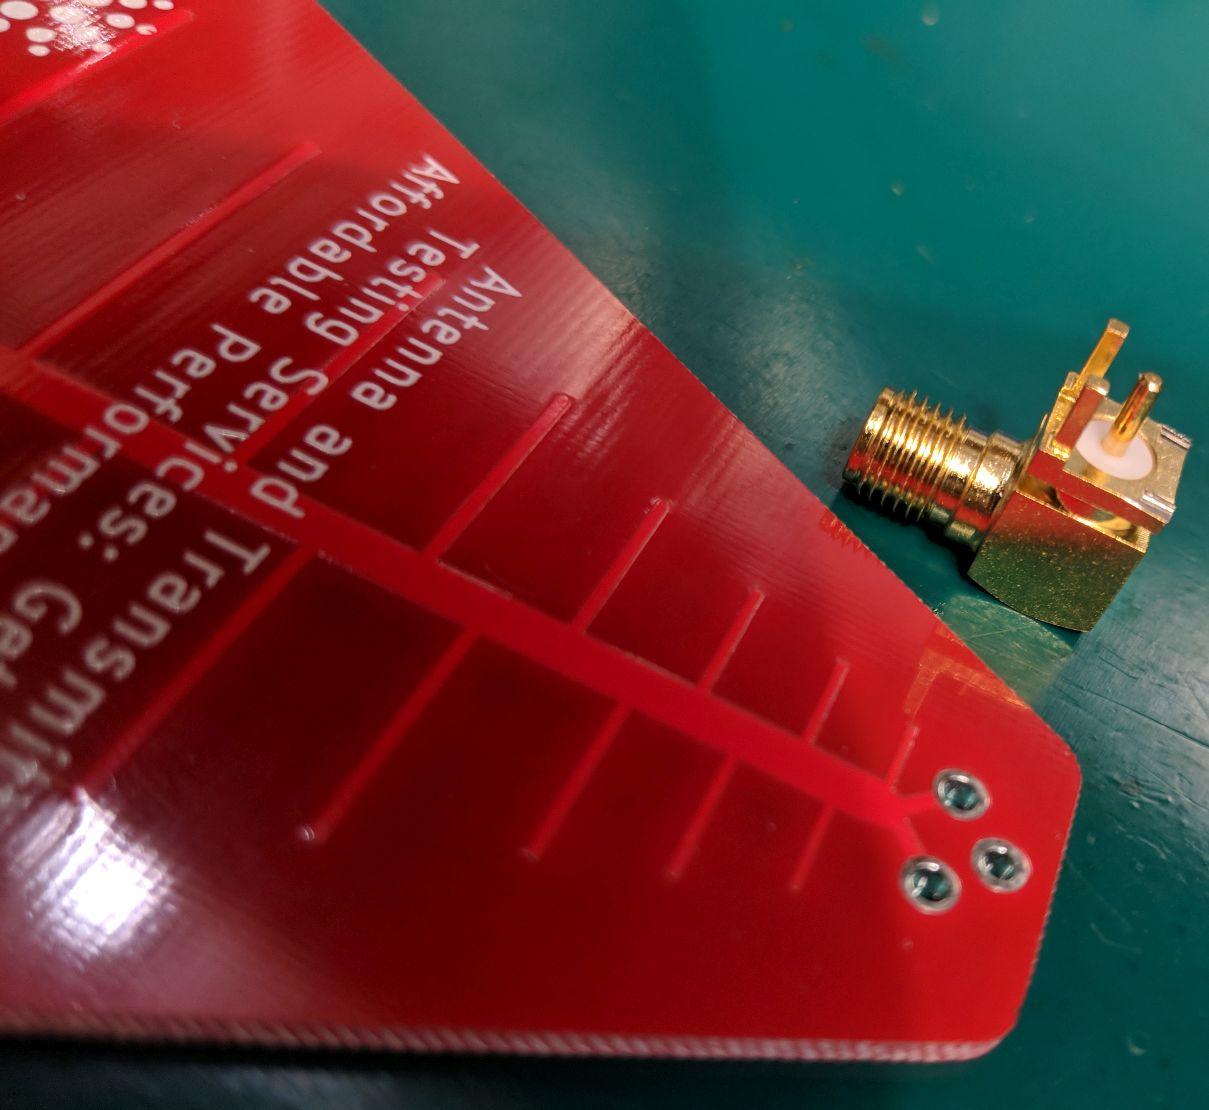 PCB0042 Log Periodic Dipole Array Antenna PCB Gain dBi SMA Pins